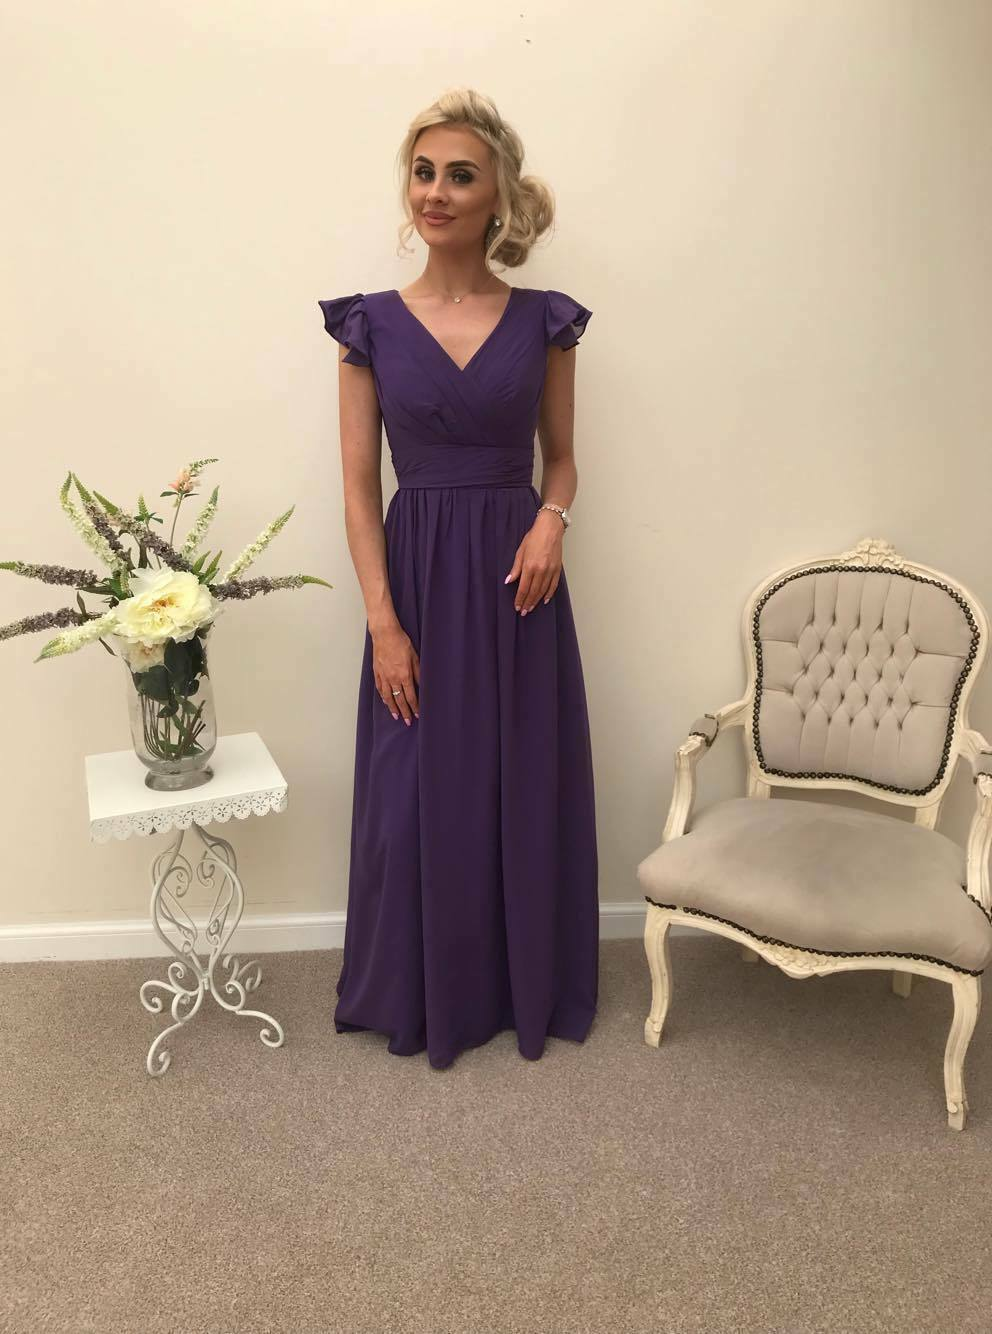 Cadbury Purple Chiffon Bridesmaid Maxi Prom Dress Wedding Party Ballgown Uk